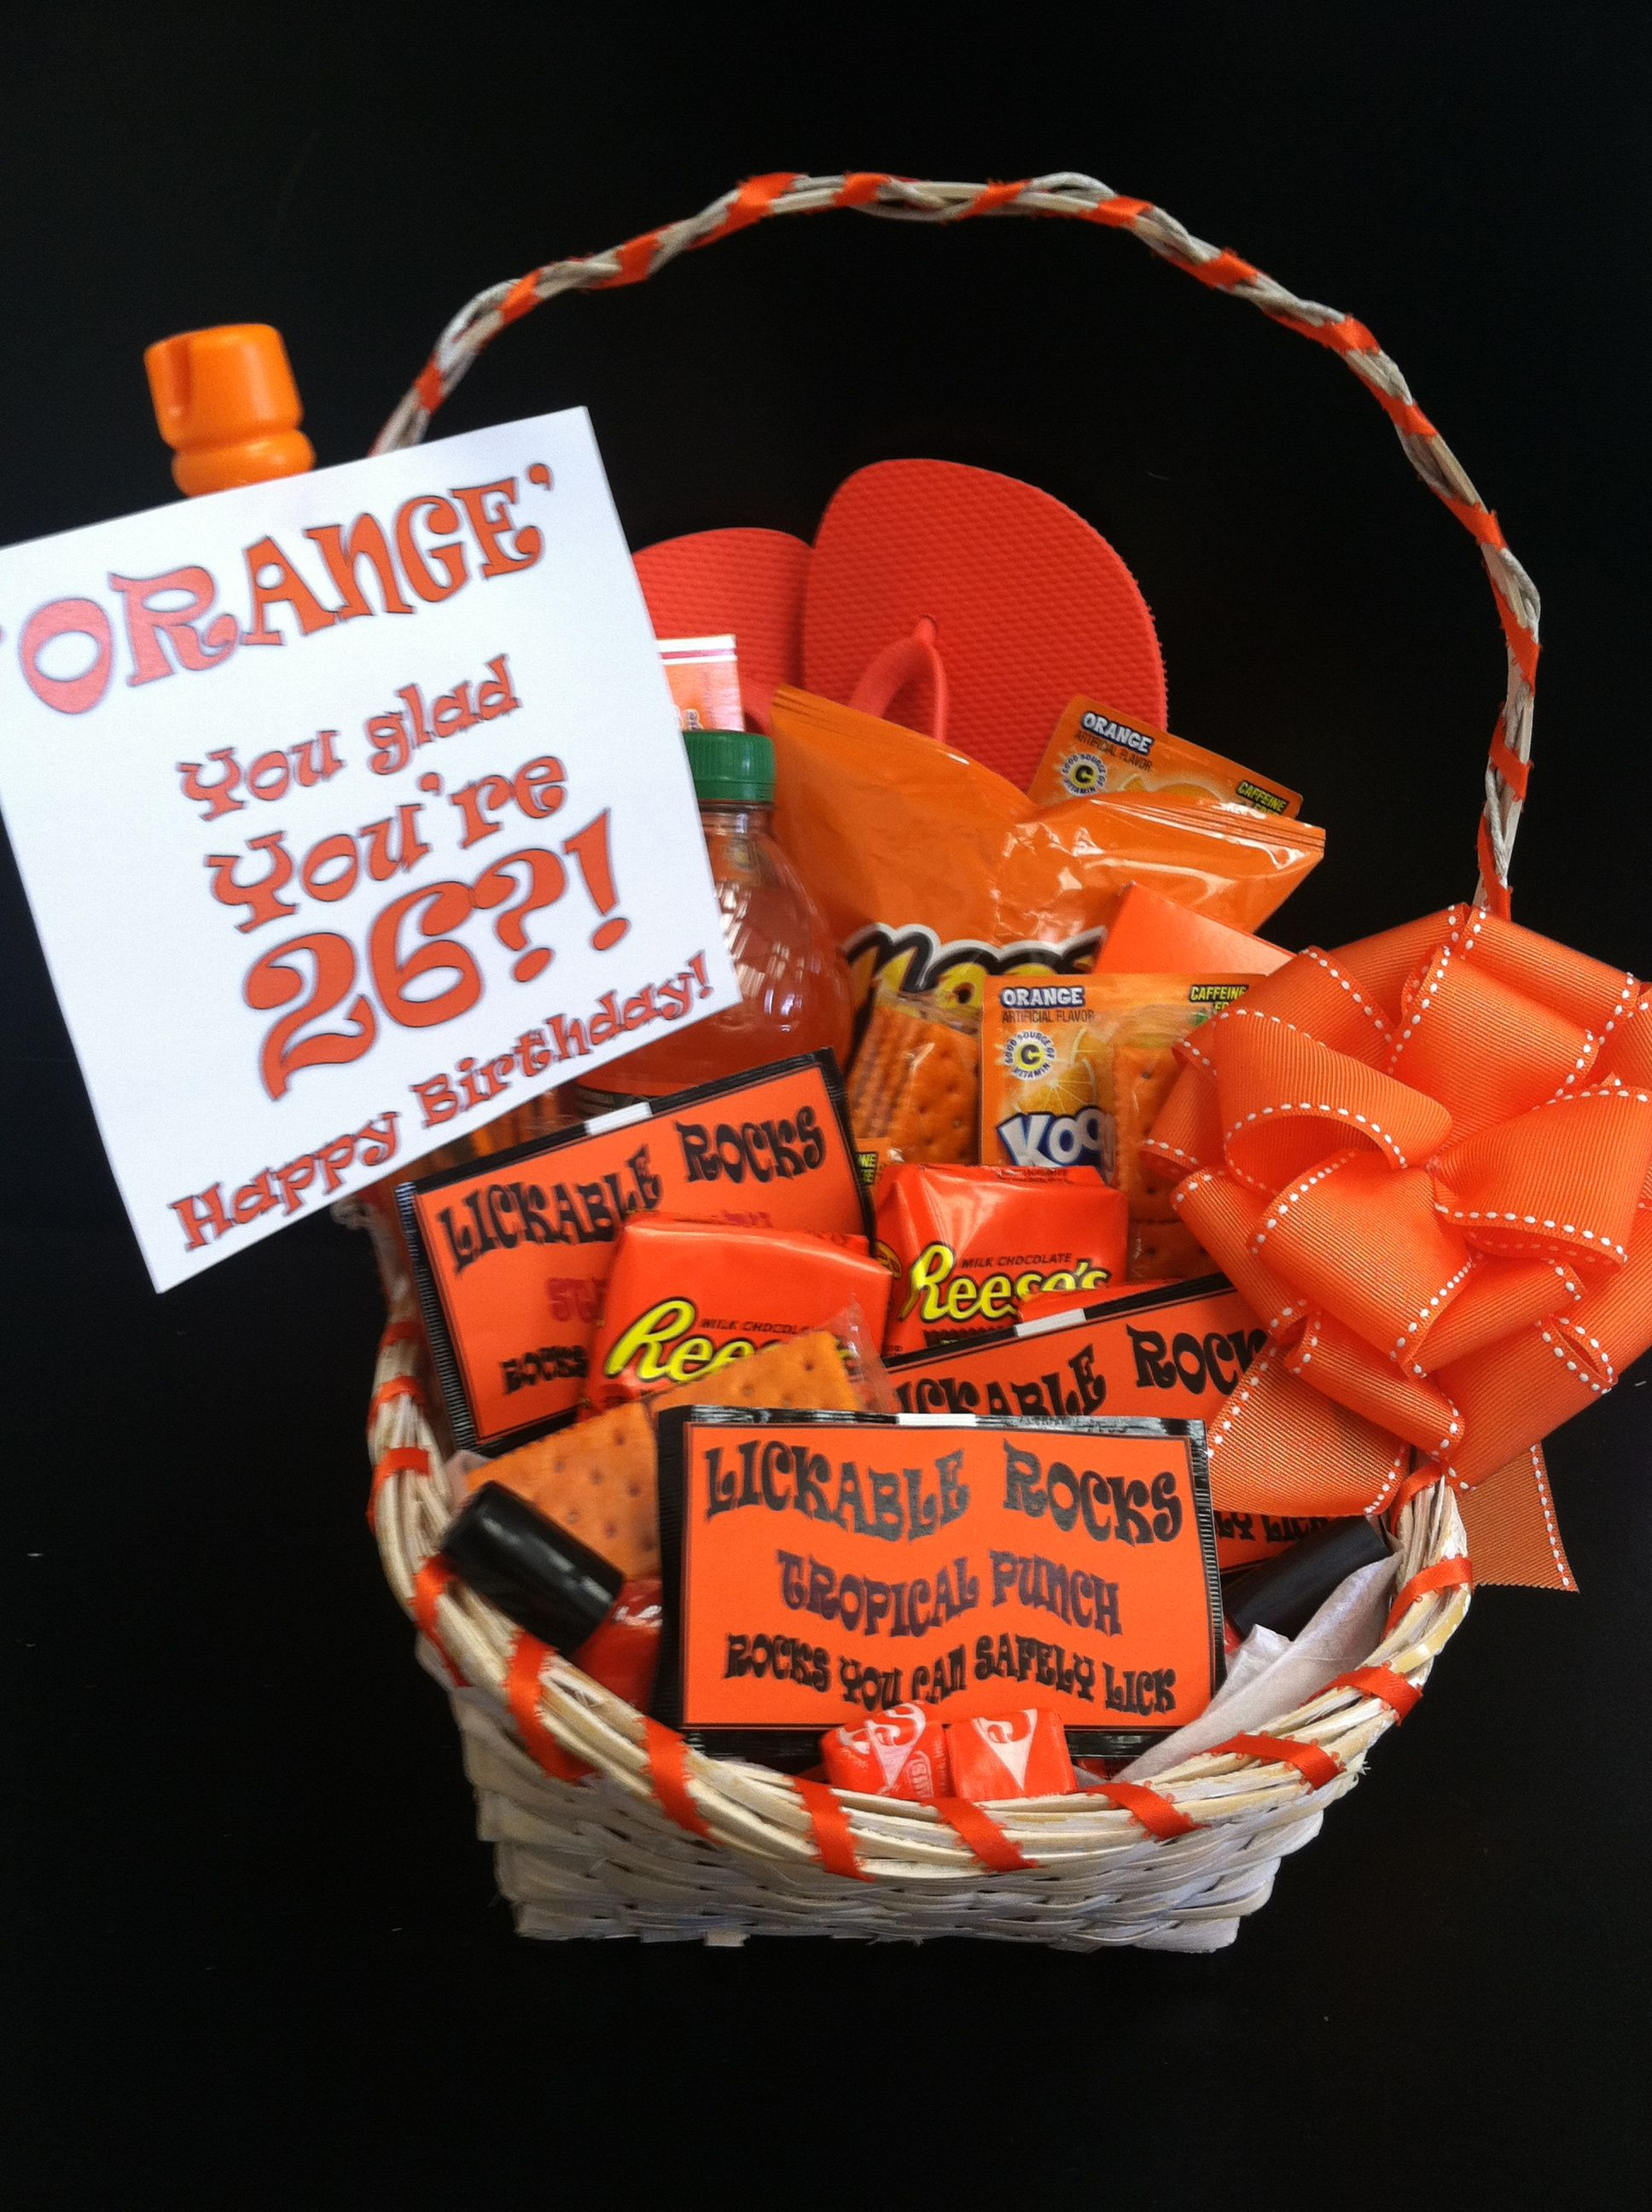 Pin By Meg Hallengren On Gift Giving Diy Gift For Bff Orange Flip Flops Diy Gifts